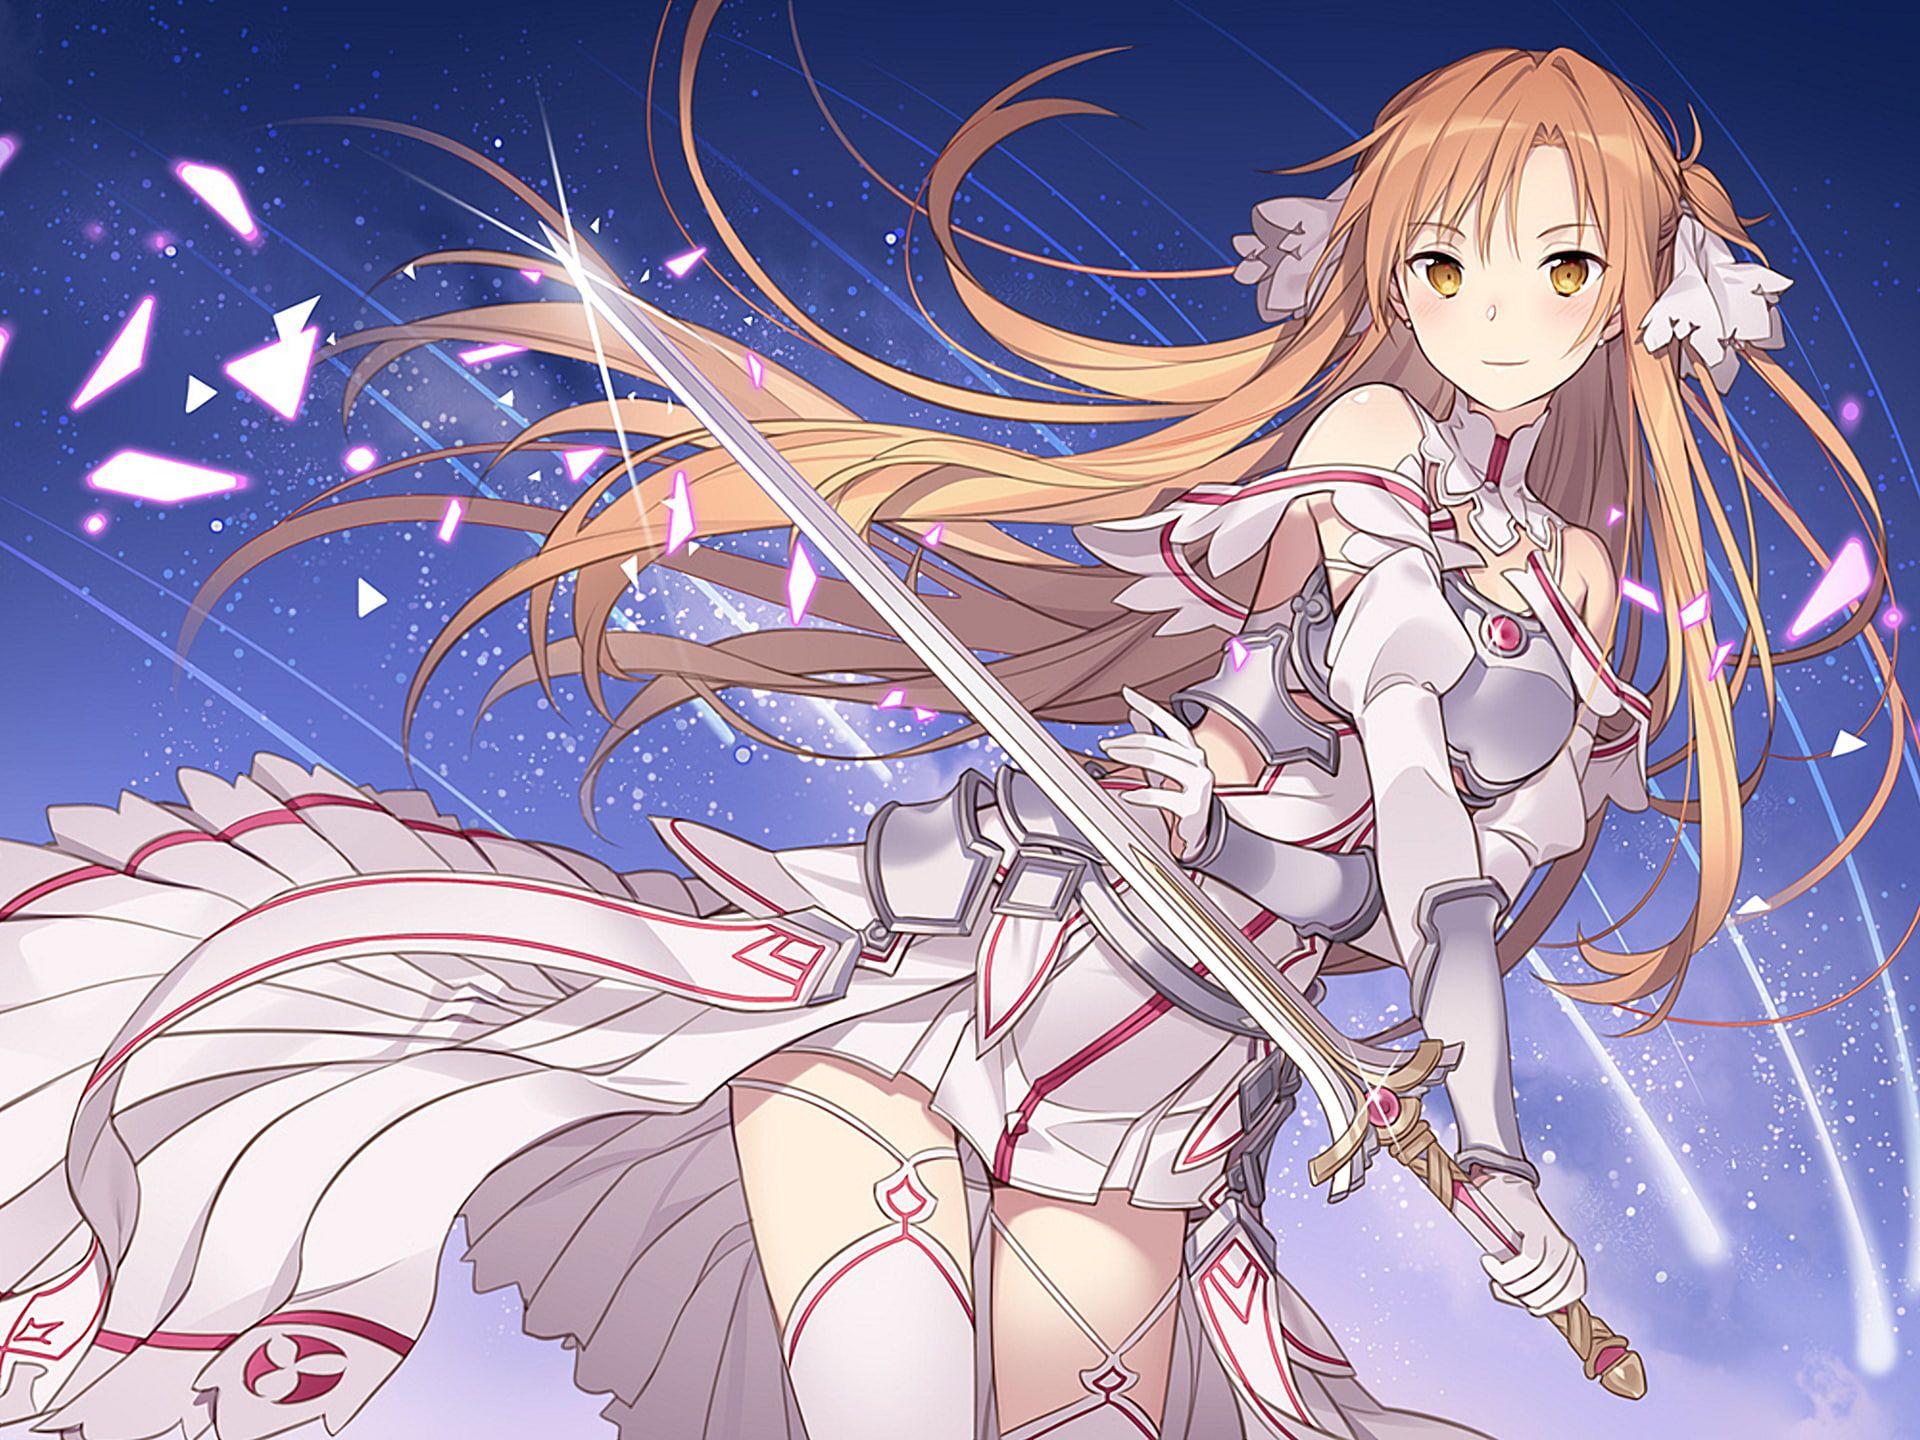 Sword Art Online Sword Art Online Alicization Asuna Yuuki 1080p Wallpaper Hdwallpaper Desktop Sword Art Online Wallpaper Sword Art Sword Art Online Asuna